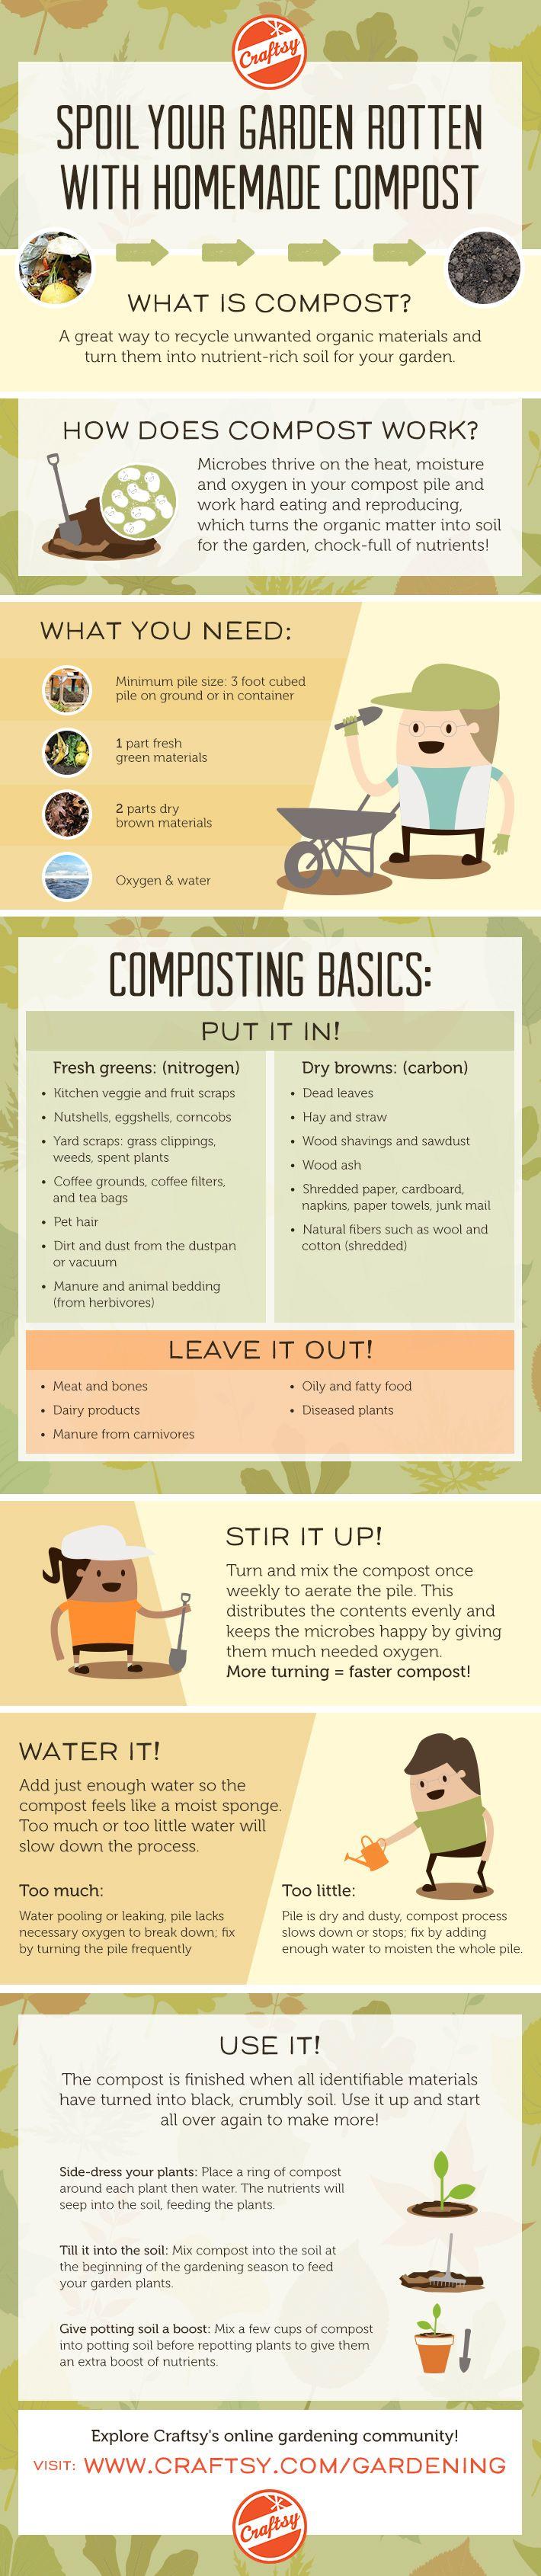 best 25 compost ideas on pinterest growing vegetables garden